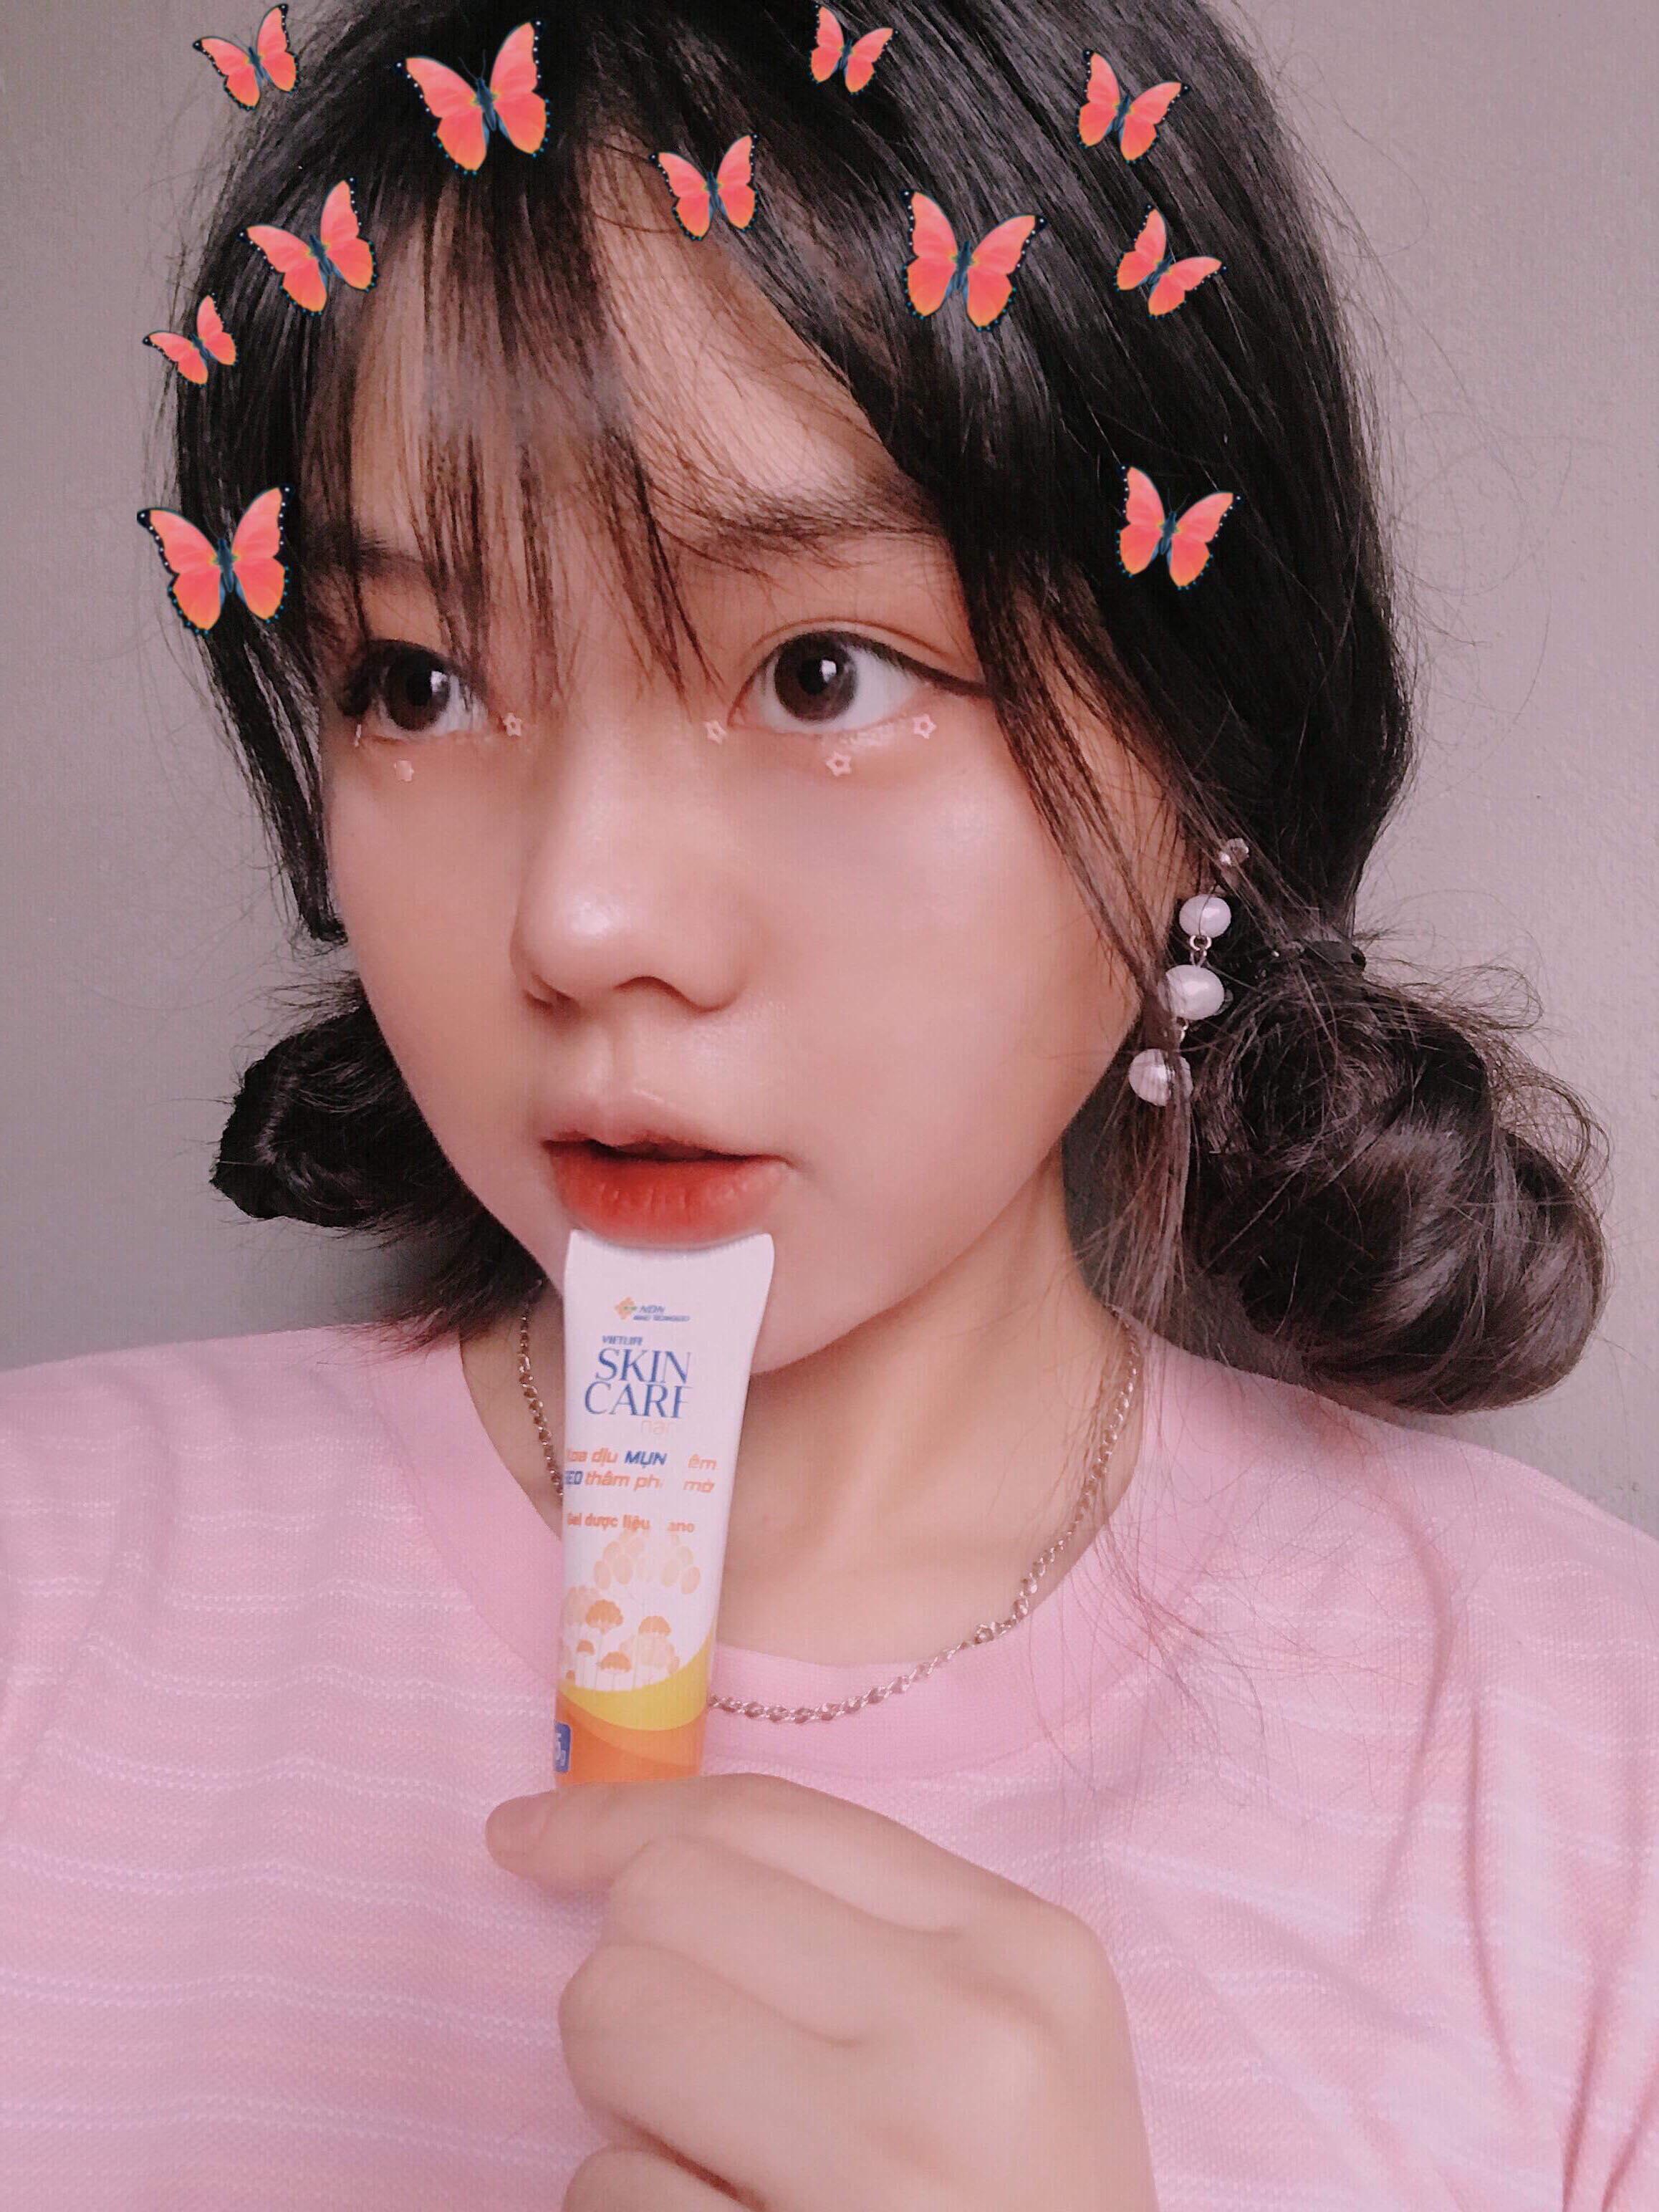 |Review| Vietlife Skincare nano giúp da mềm mịn trắng sáng 1